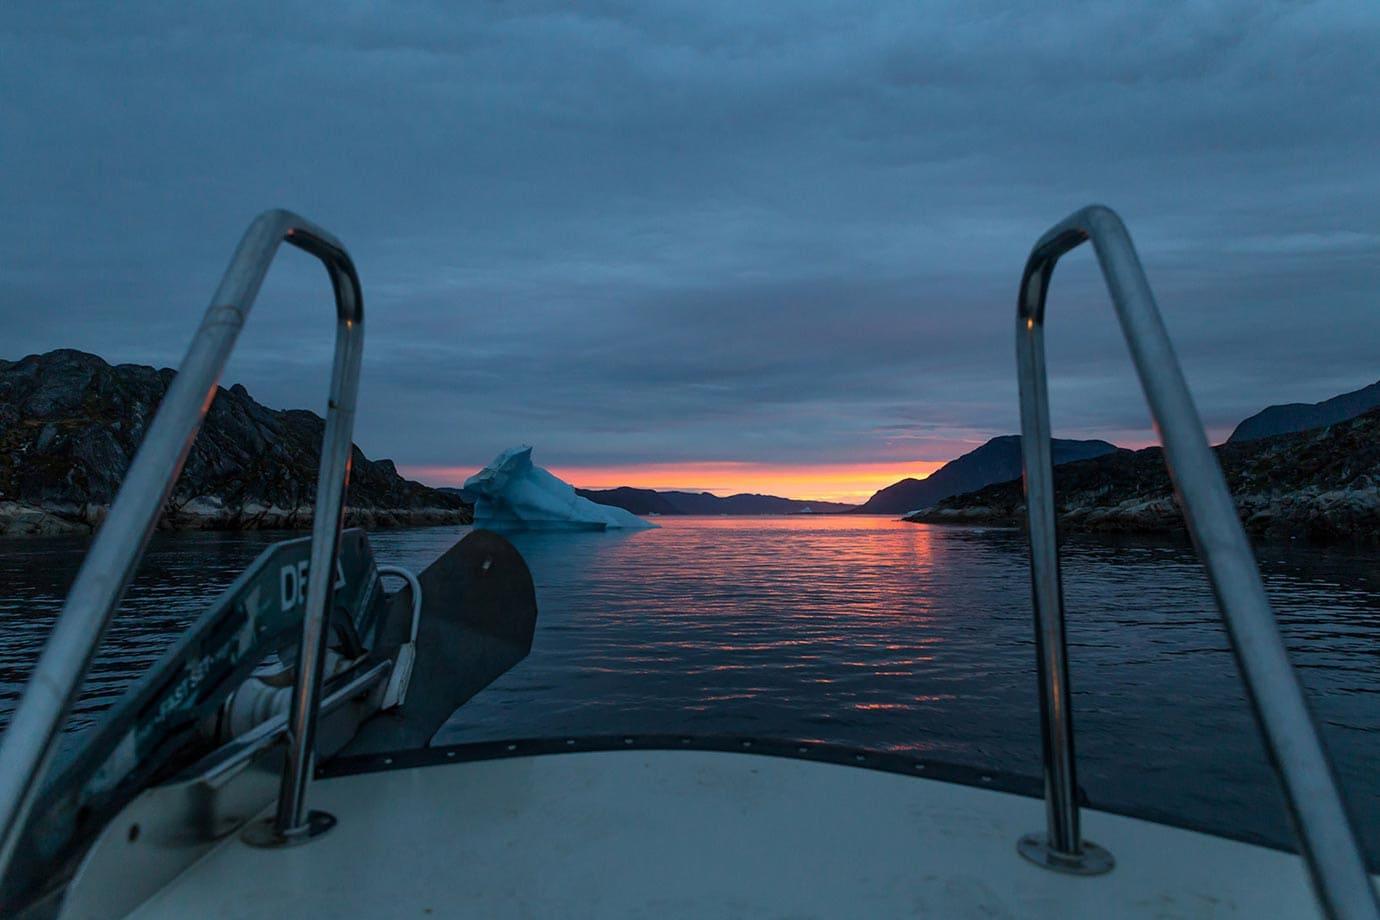 Sunset in Qaqortoq